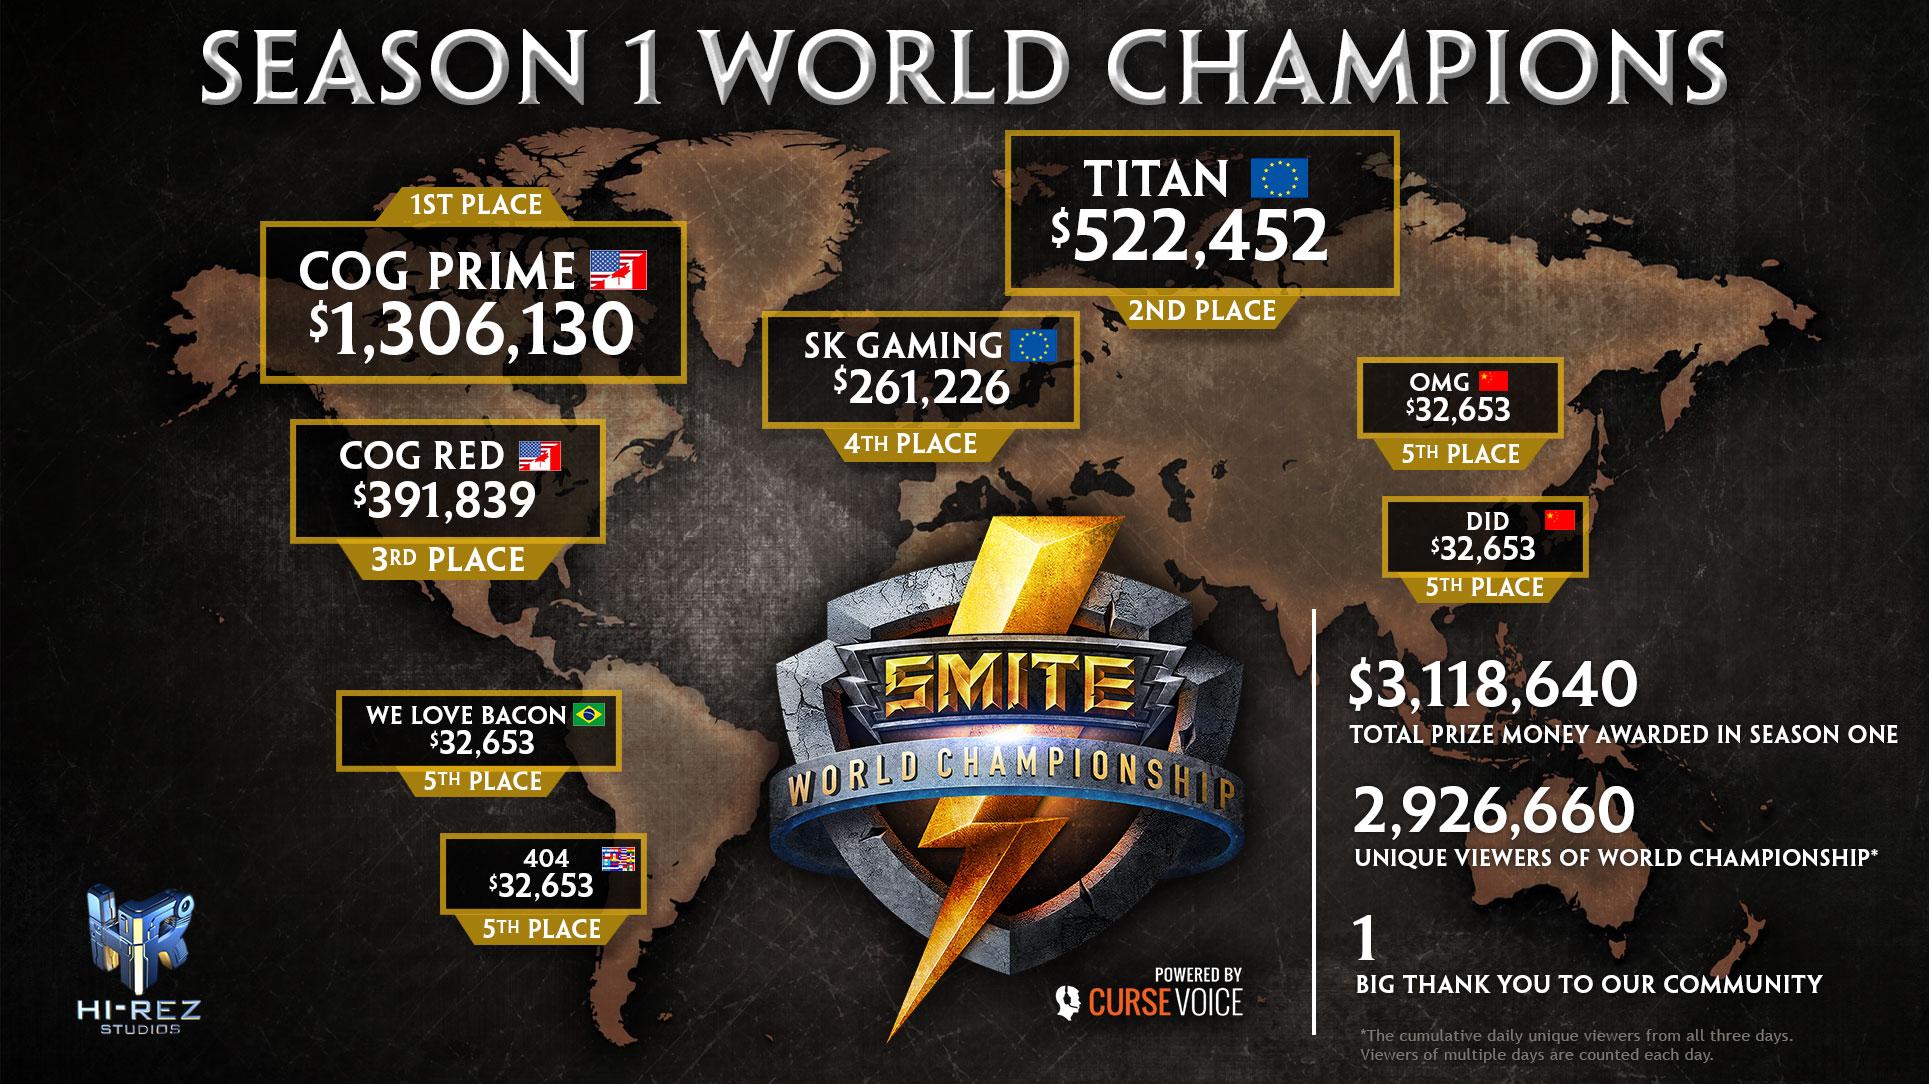 SMITE World Championship _SWC_Infographic_2015_Jan13